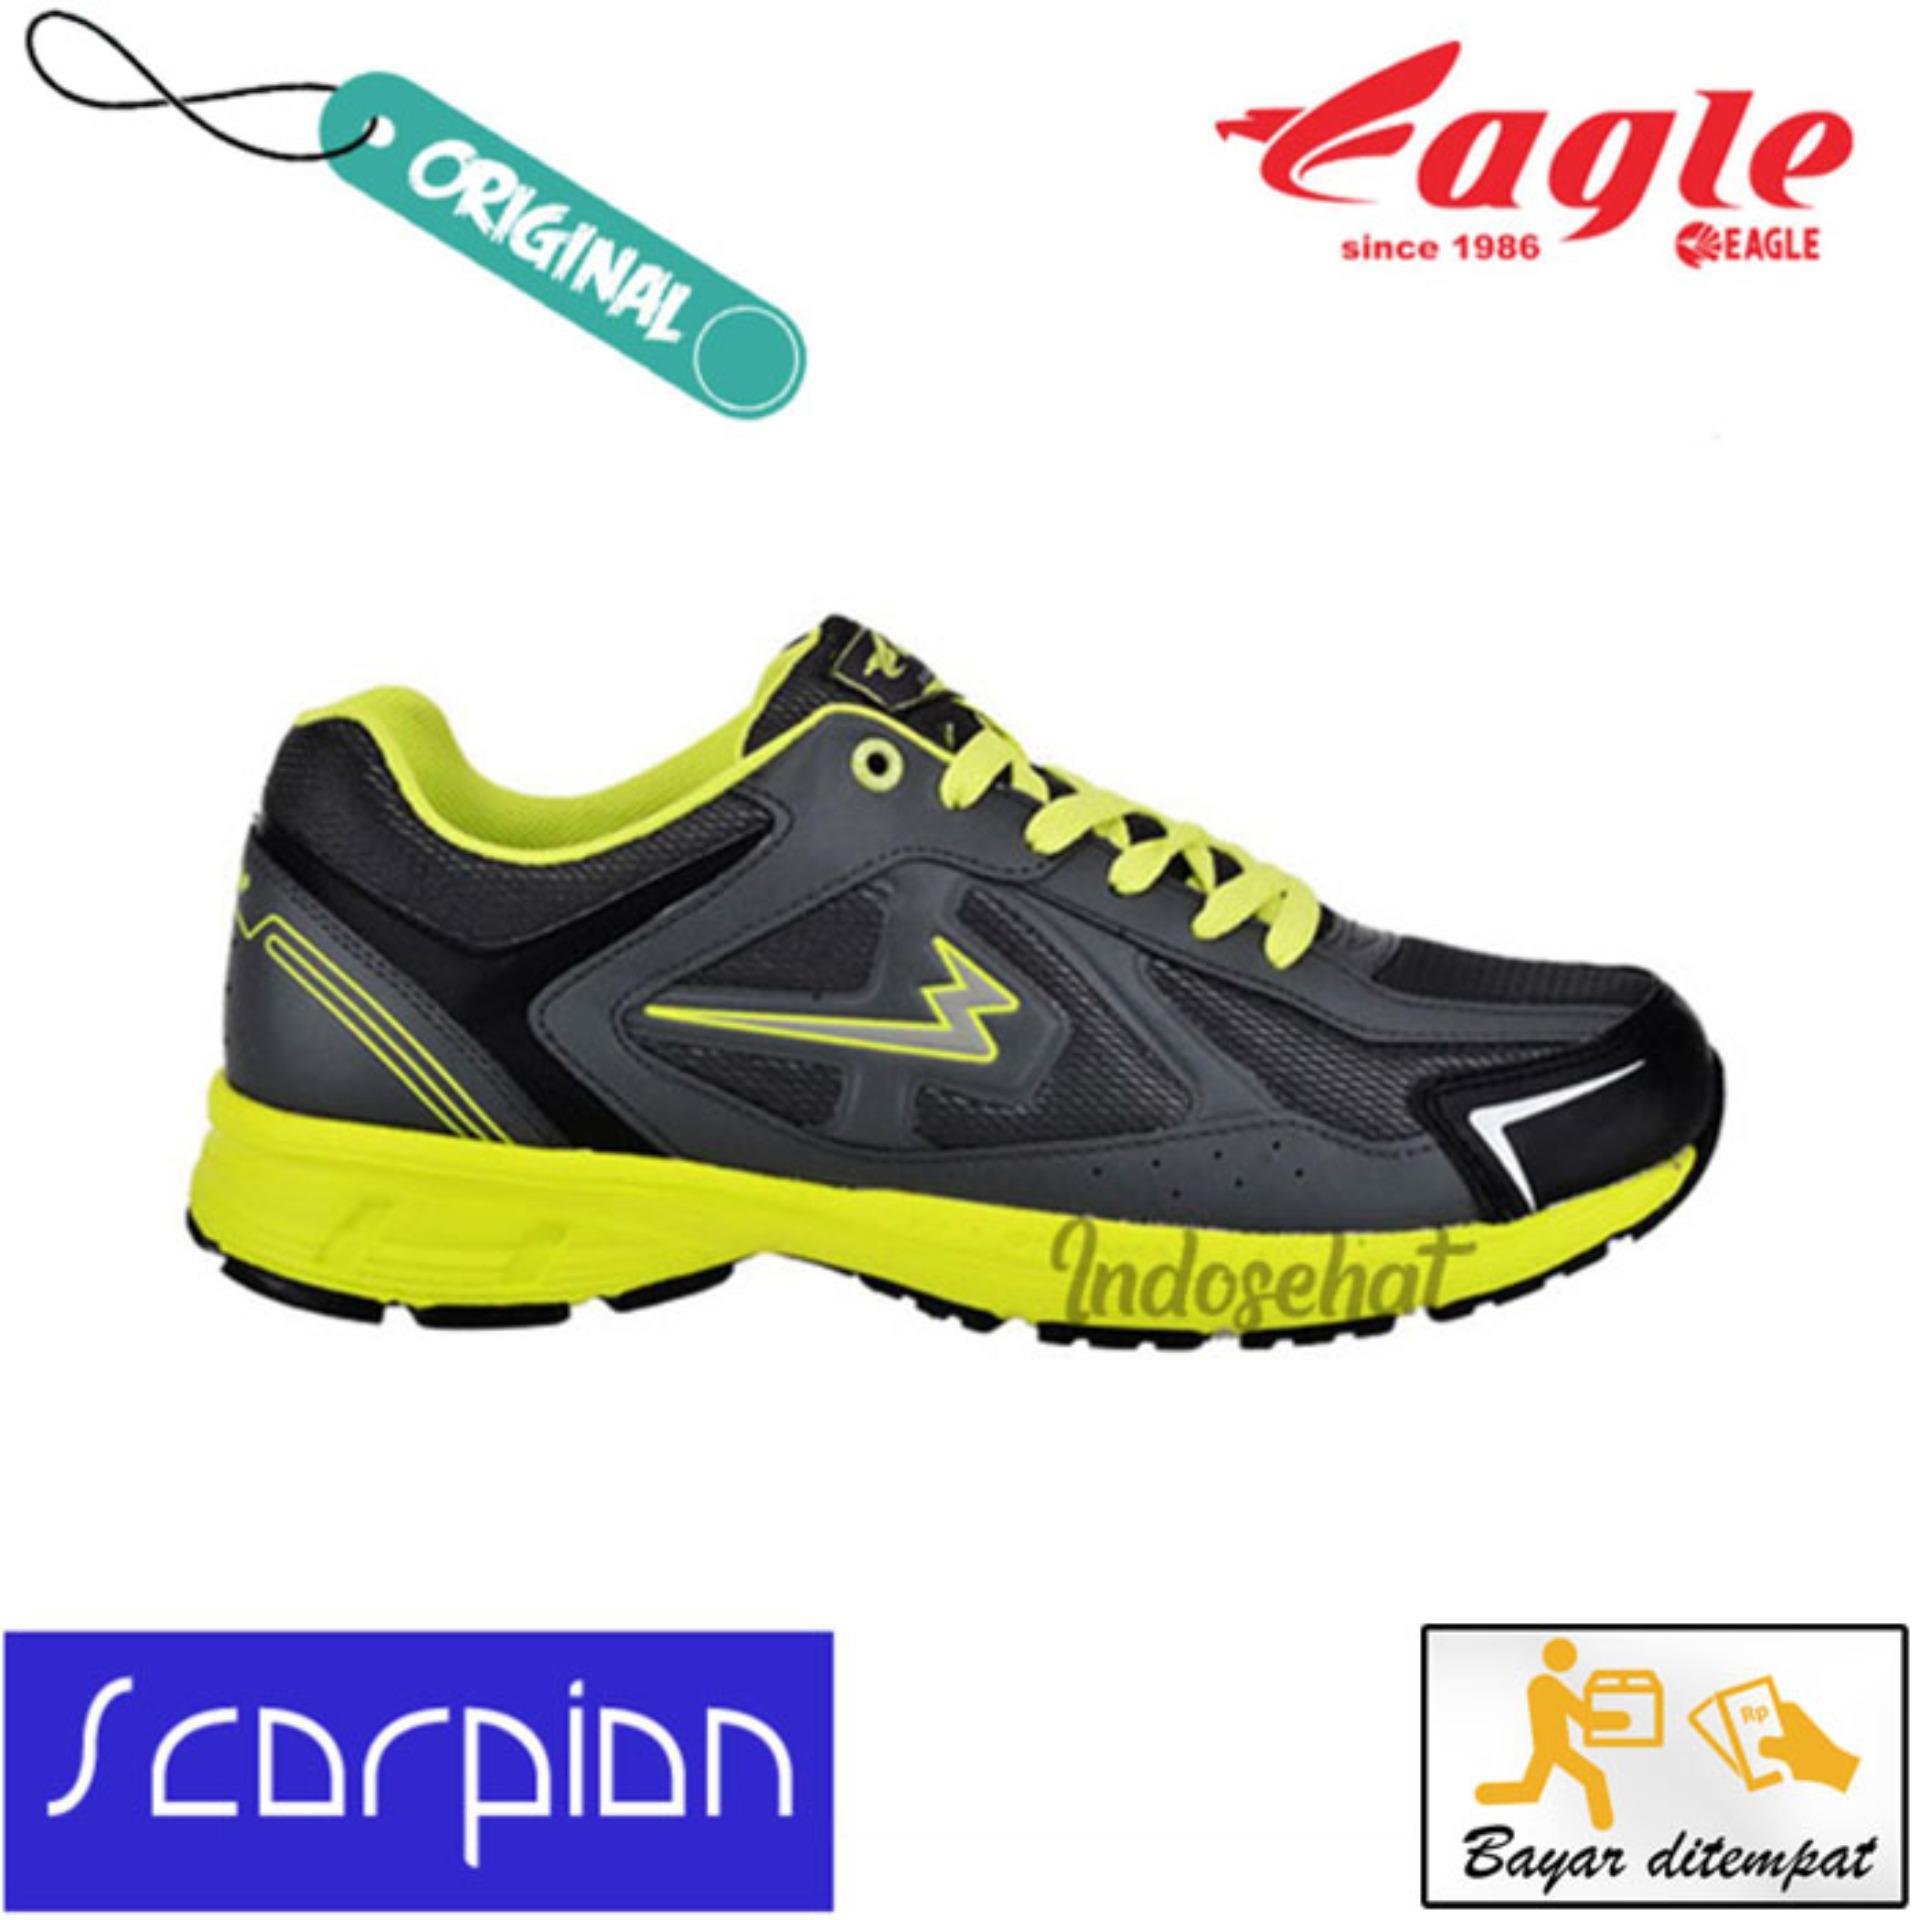 Informasi Harga Terbaru Sepatu Lari Eagle Bulan November 2018 Jasmine Running Wanita Blue Citroen 41 Scorpion